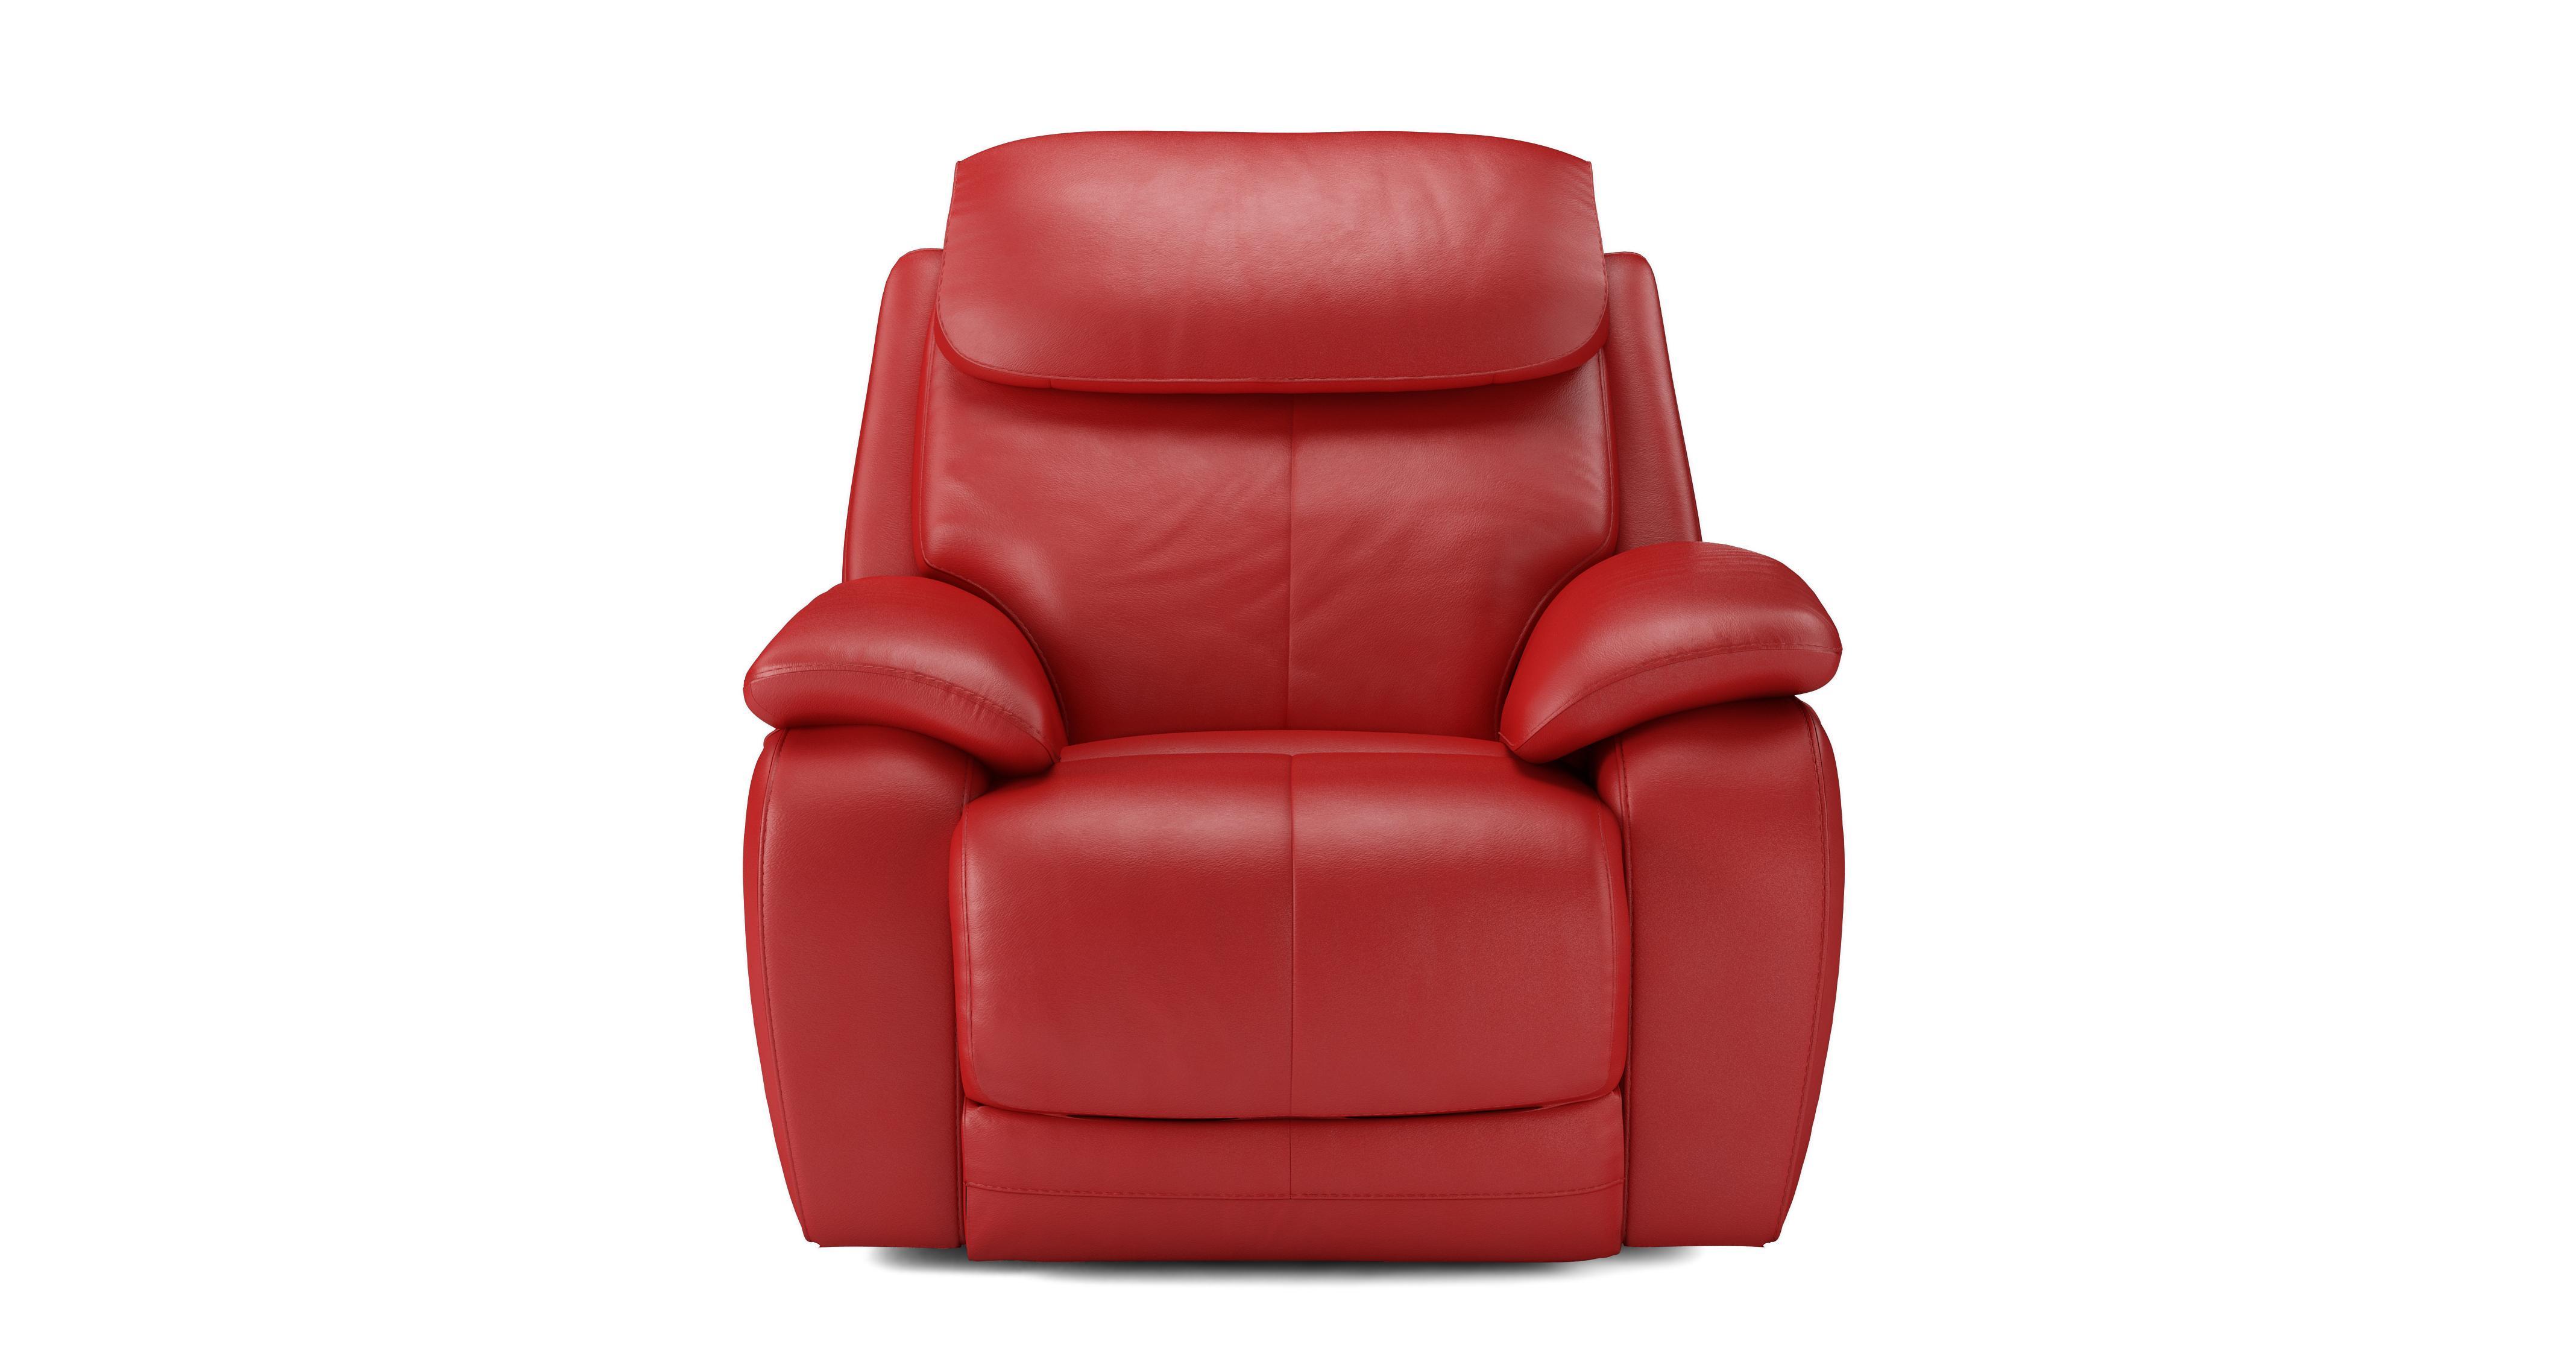 Daytona Electric Recliner Chair Peru